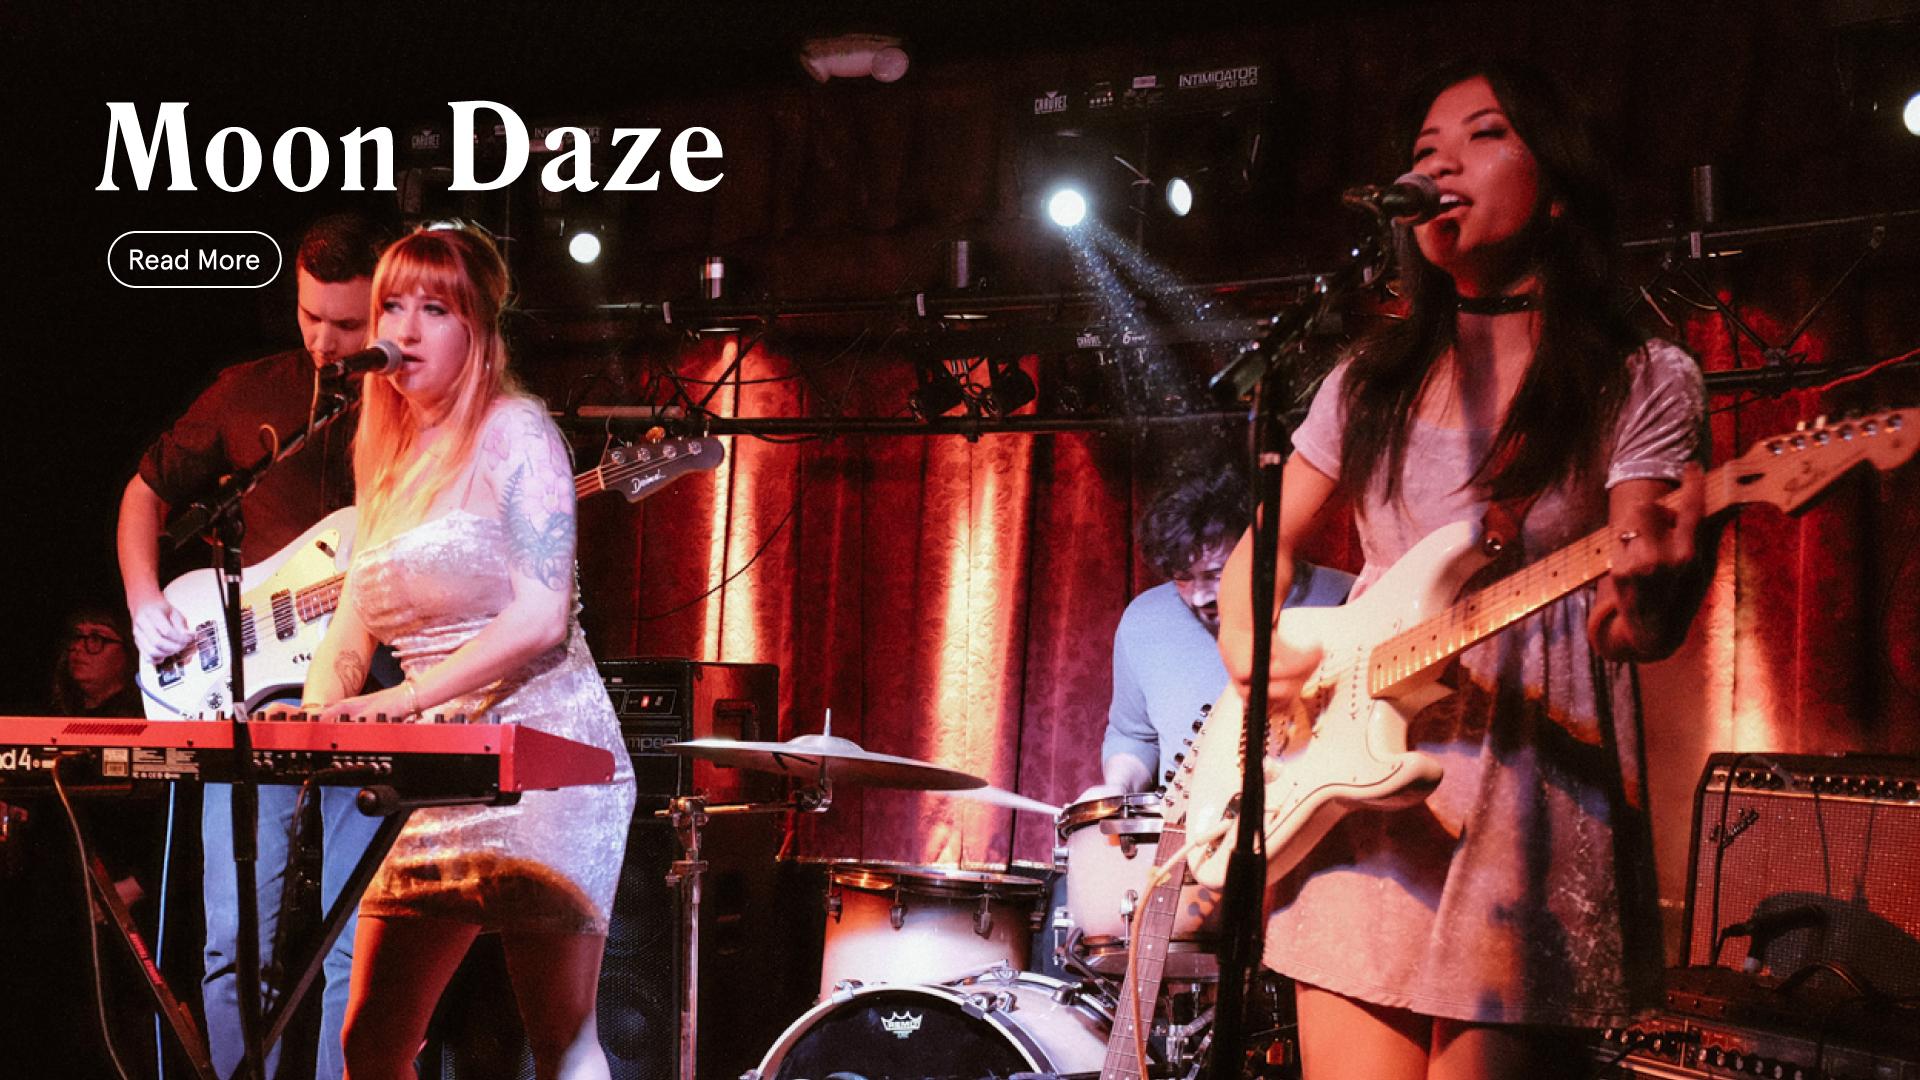 Moon Daze